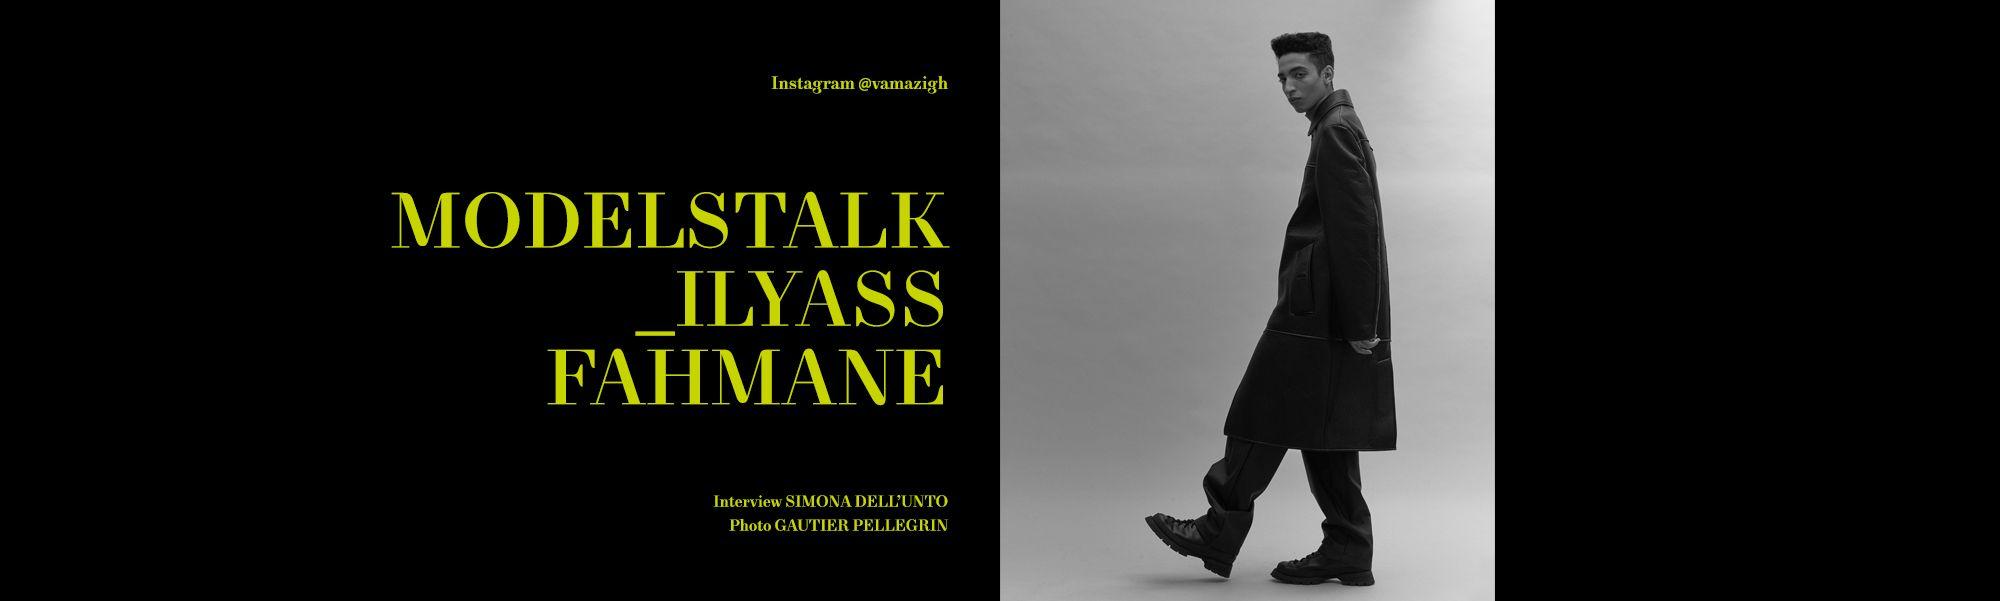 Ilyass-fahmane-thegreatestmagazine-main-banner